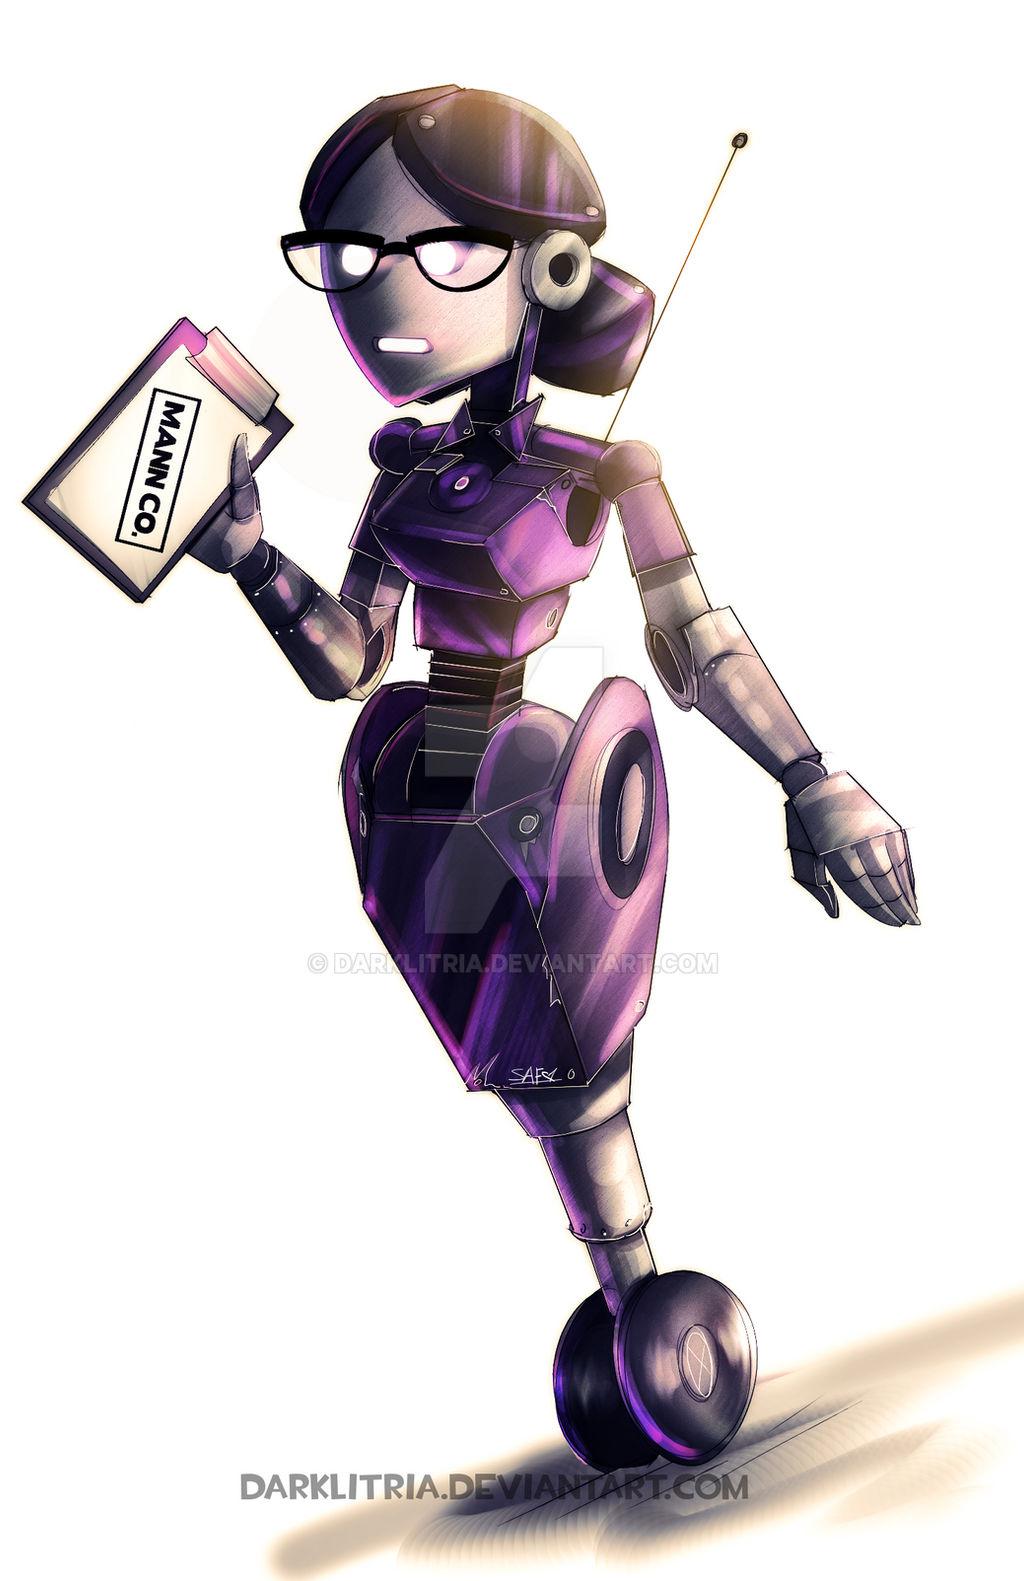 TF2: Robots has Feelings by DarkLitria on DeviantArt in